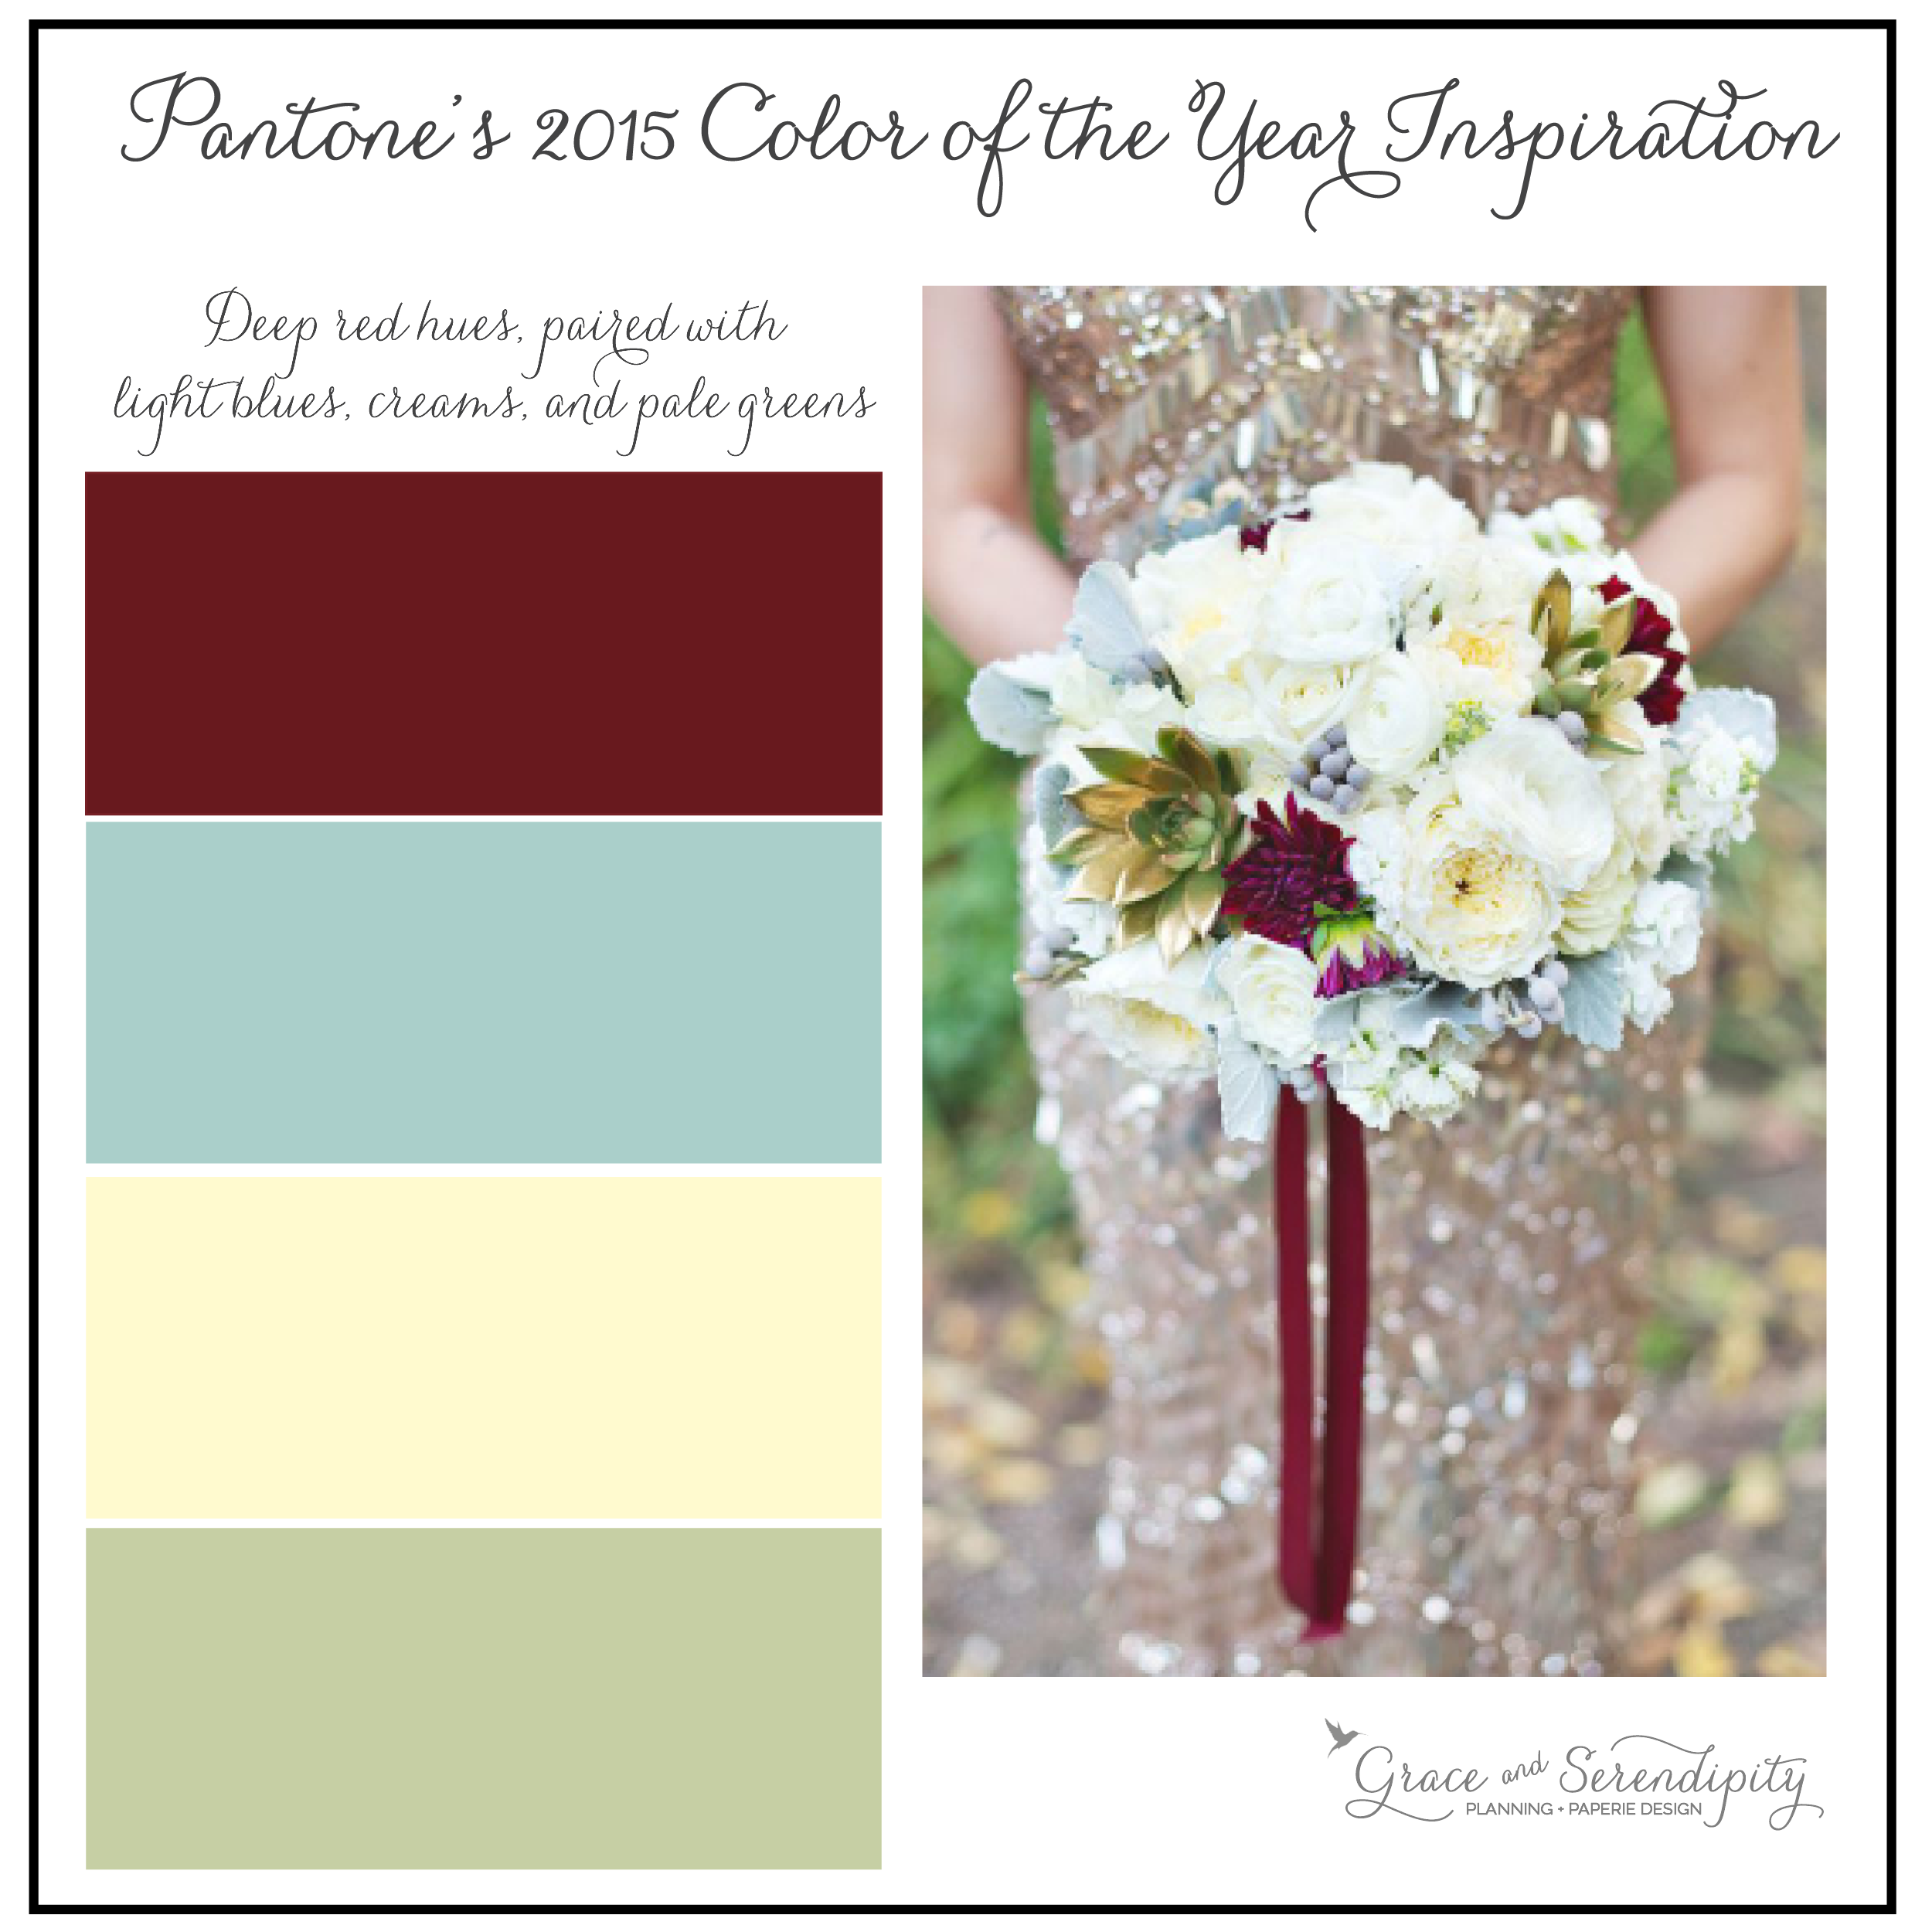 grace and serendipity - marsala inspiration board - burgundy, mint, cream, green